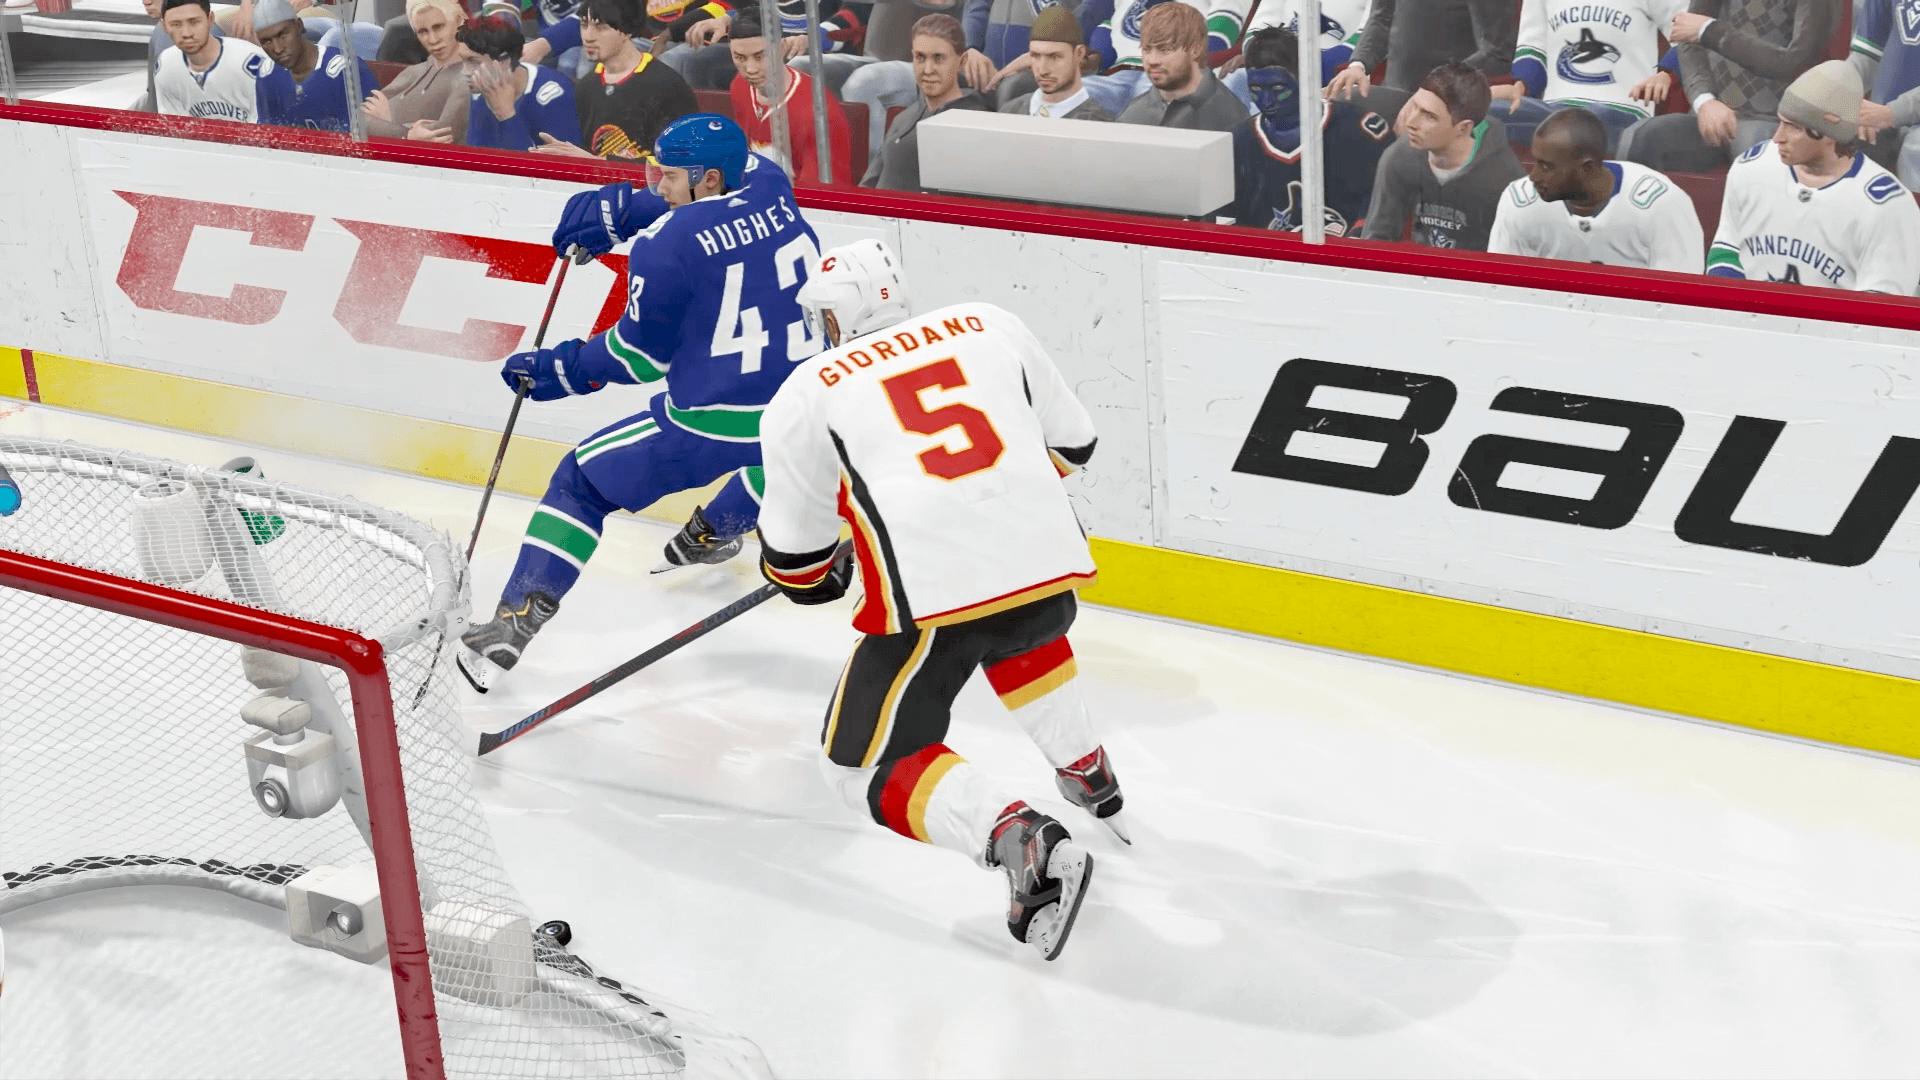 EA NHL 21 Update 1.31 December 10